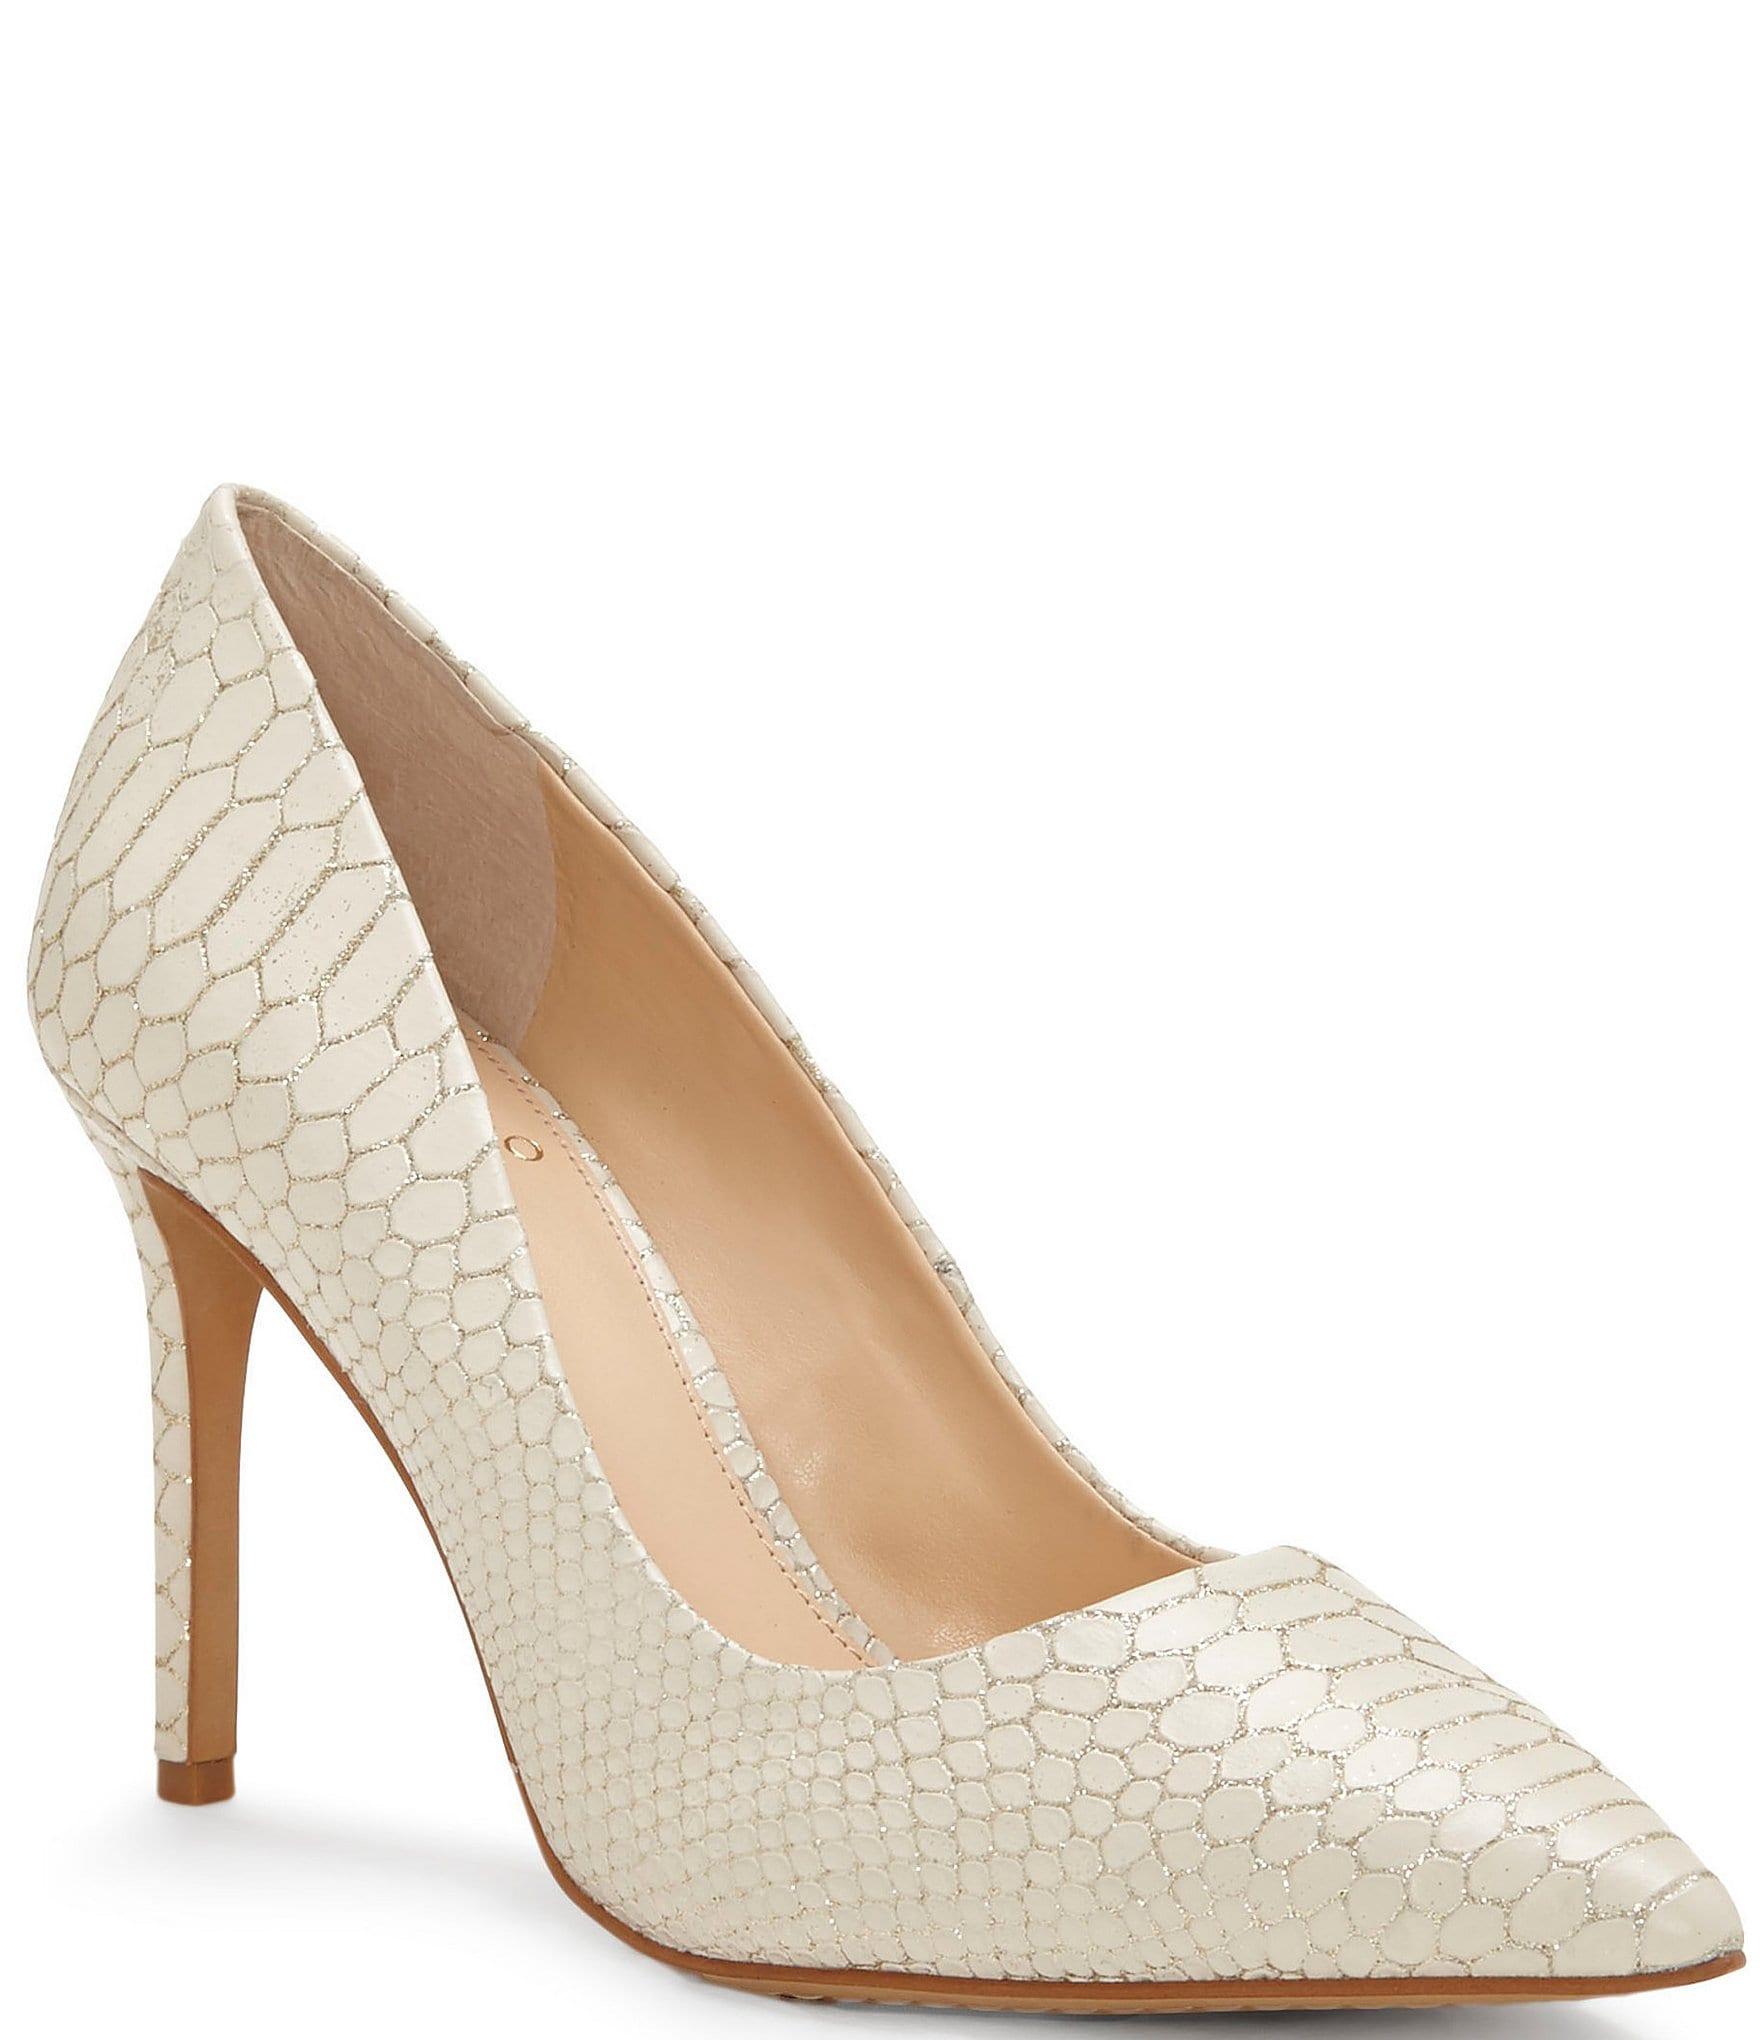 daf44269e355 Vince Camuto Women s Heels